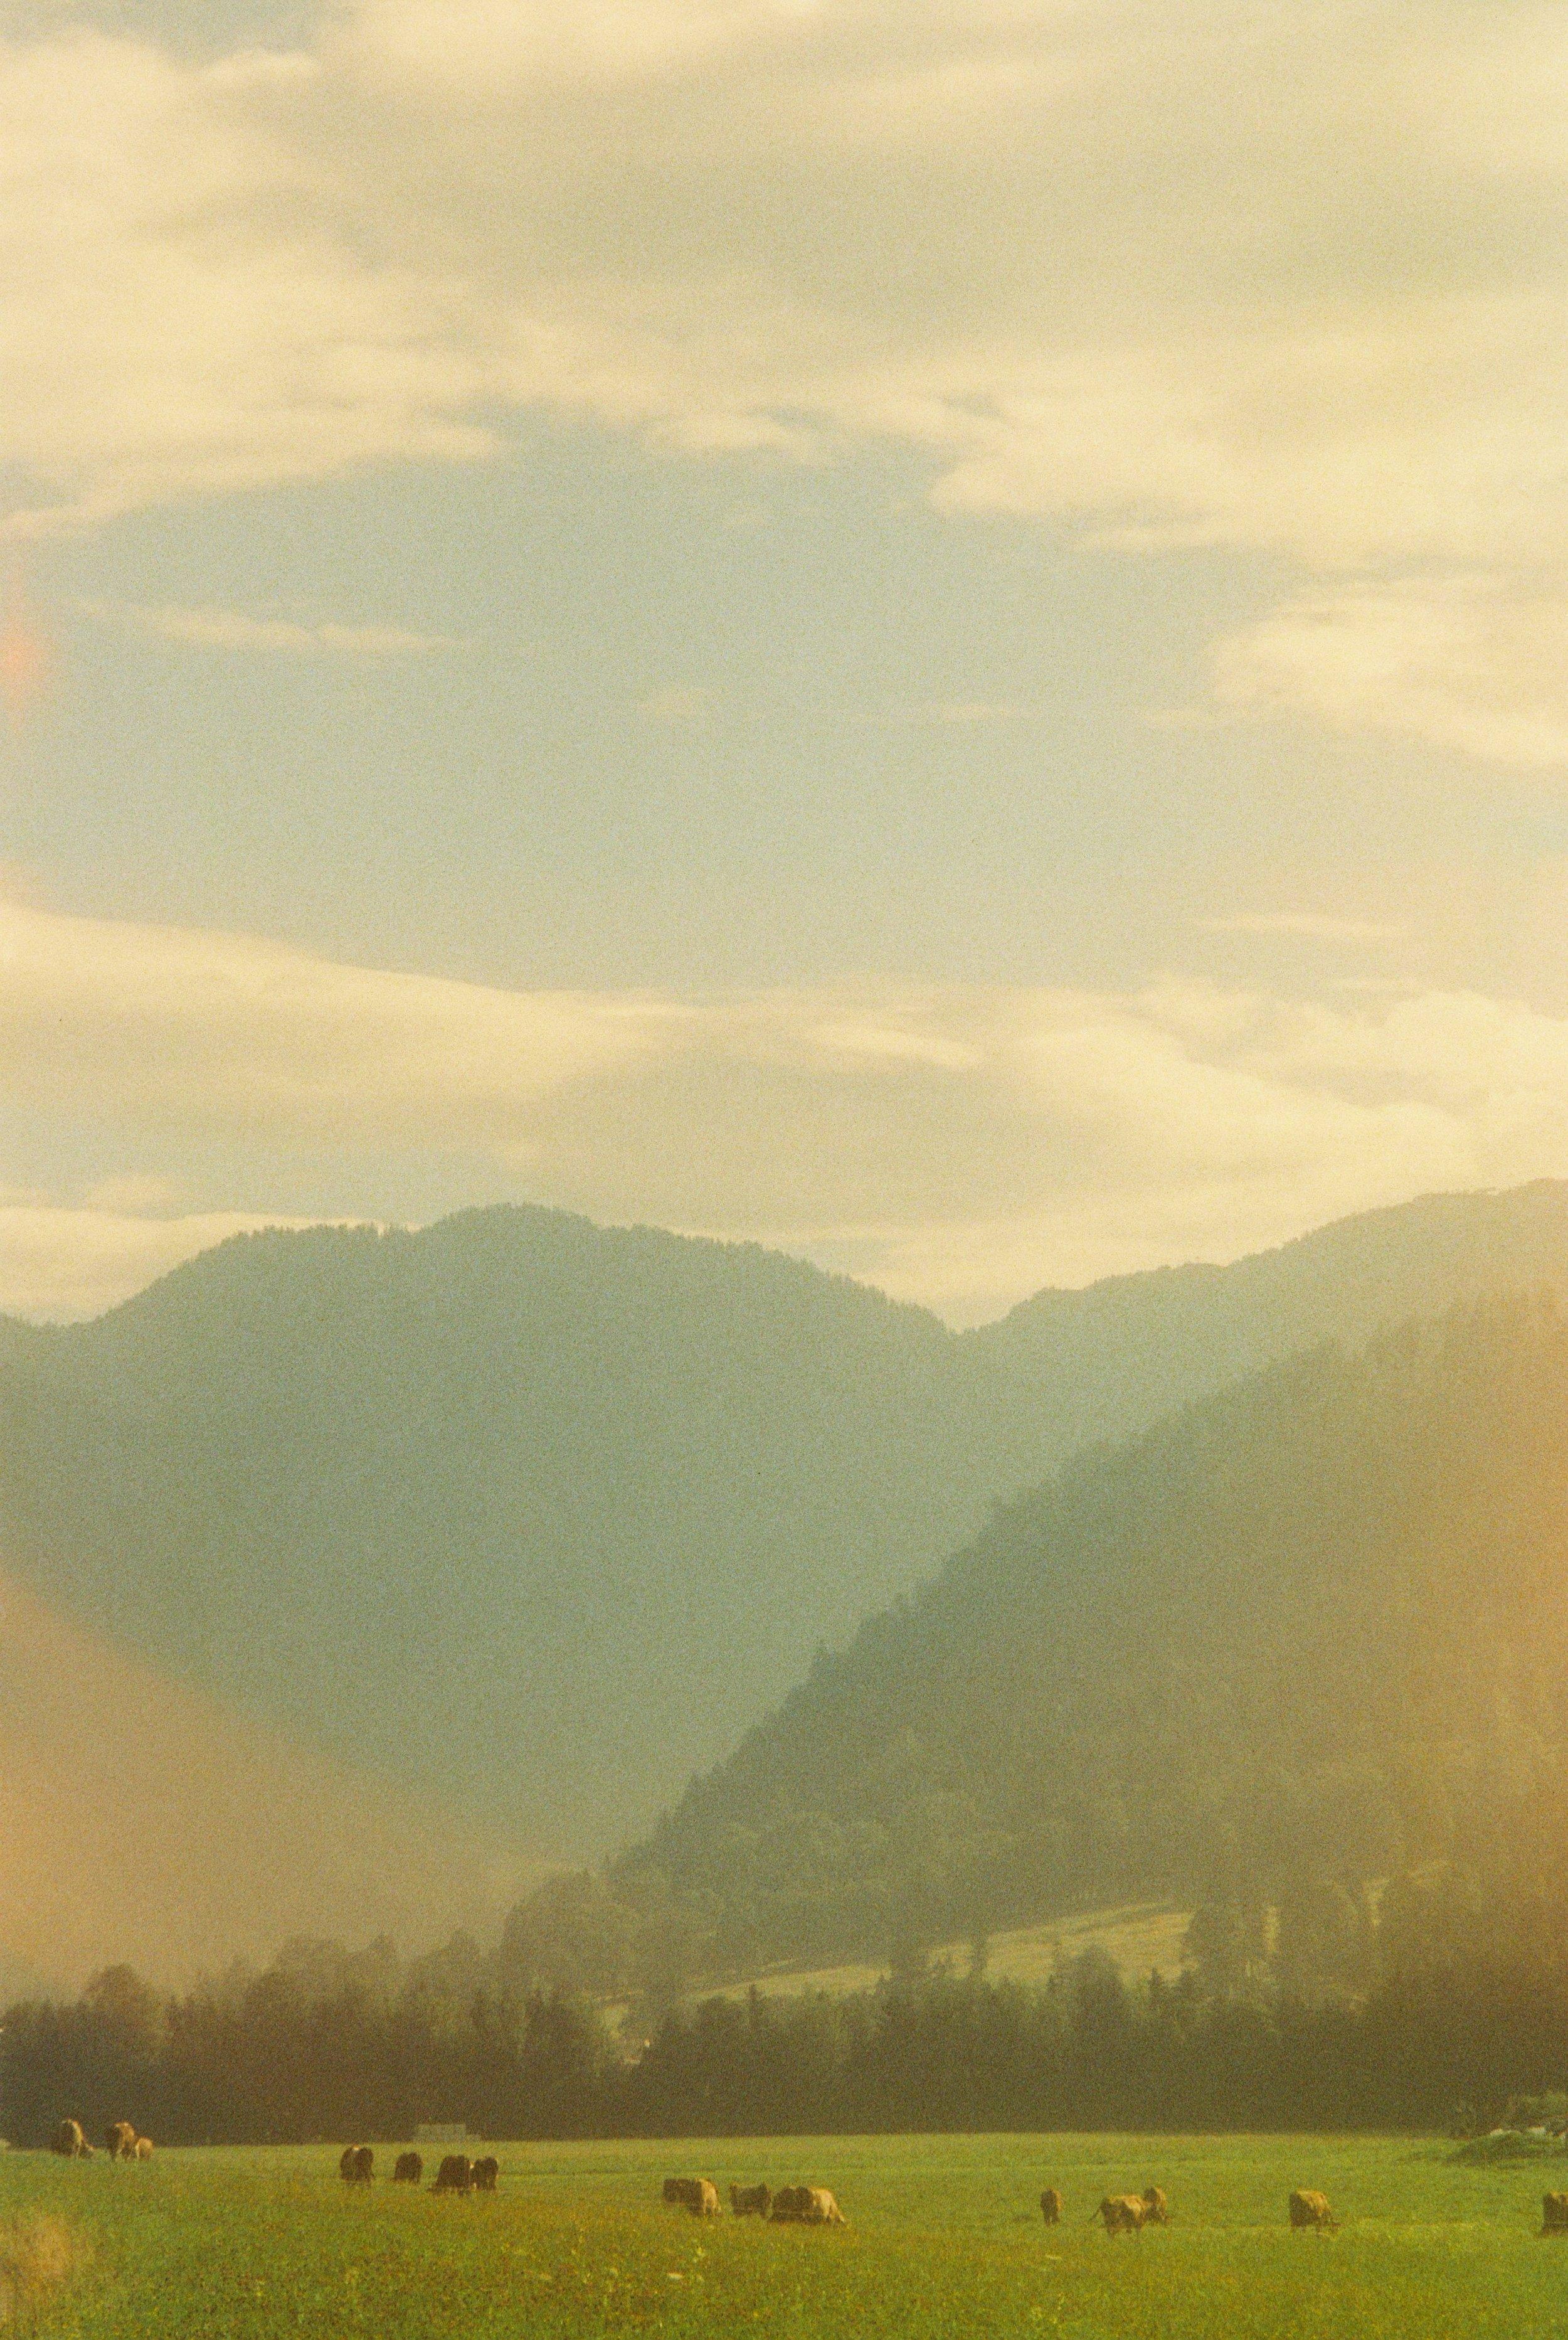 Kirchdorf, Tirol Austria